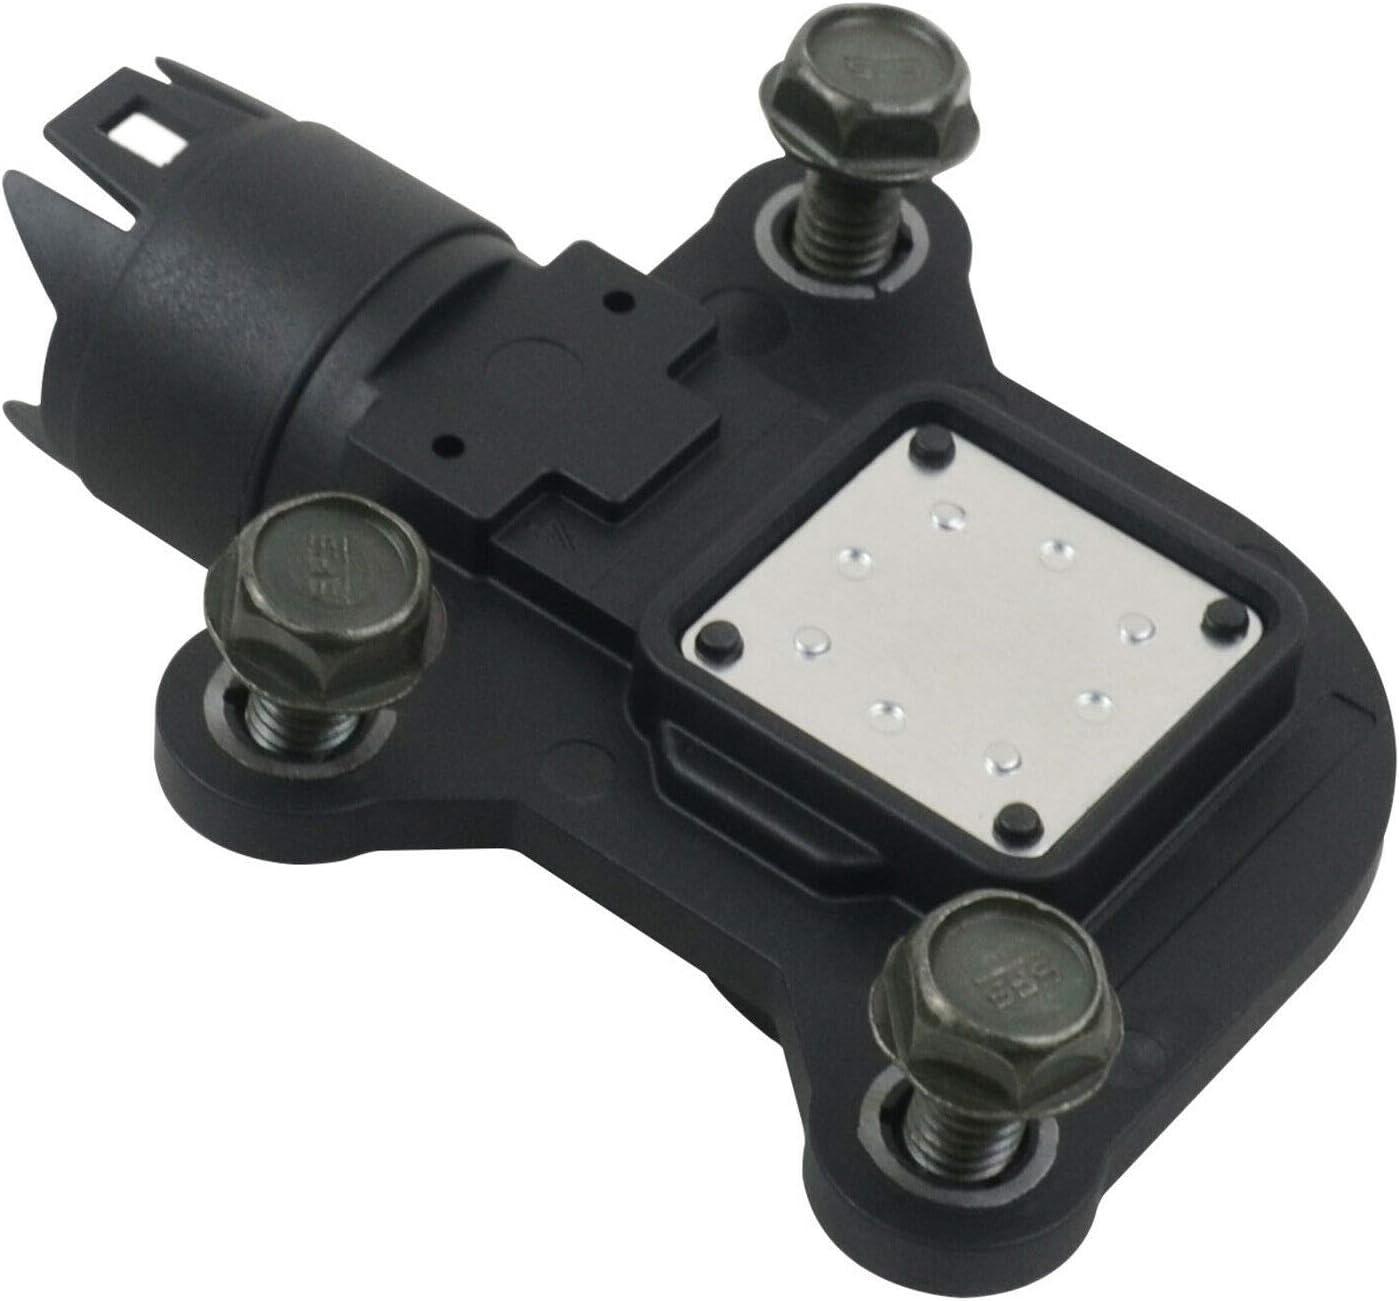 Standards UNC 3-in-1 360/° Heavy Duty Swivel Head Fastening Tool for 1//4 Rivet AVAK MaxDuty Swivel TRIO 3//8 Blind Rivet Nut and 5//16 Rivet Stud.